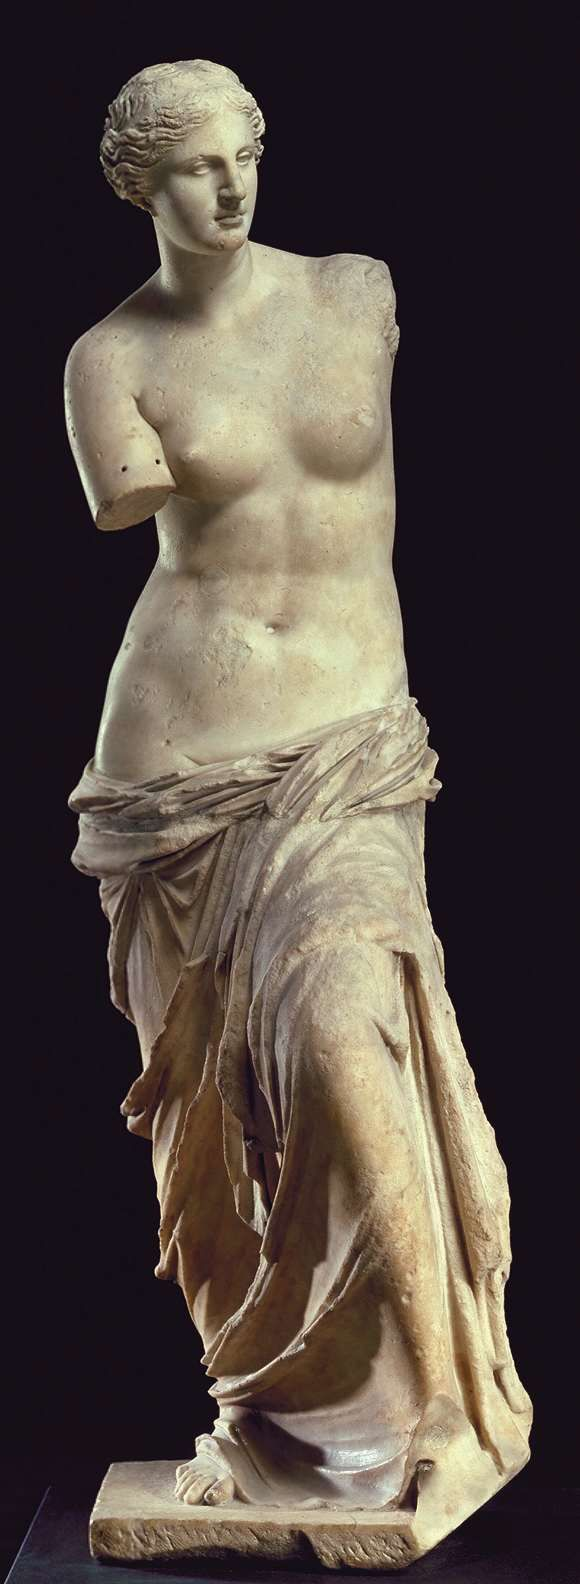 TRAVEL'IN GREECE I Venus de Milo (Aphrodite), Greek statue (marble), discovered on the island of #Milos, 2nd century BC (Musée du Louvre, Paris).